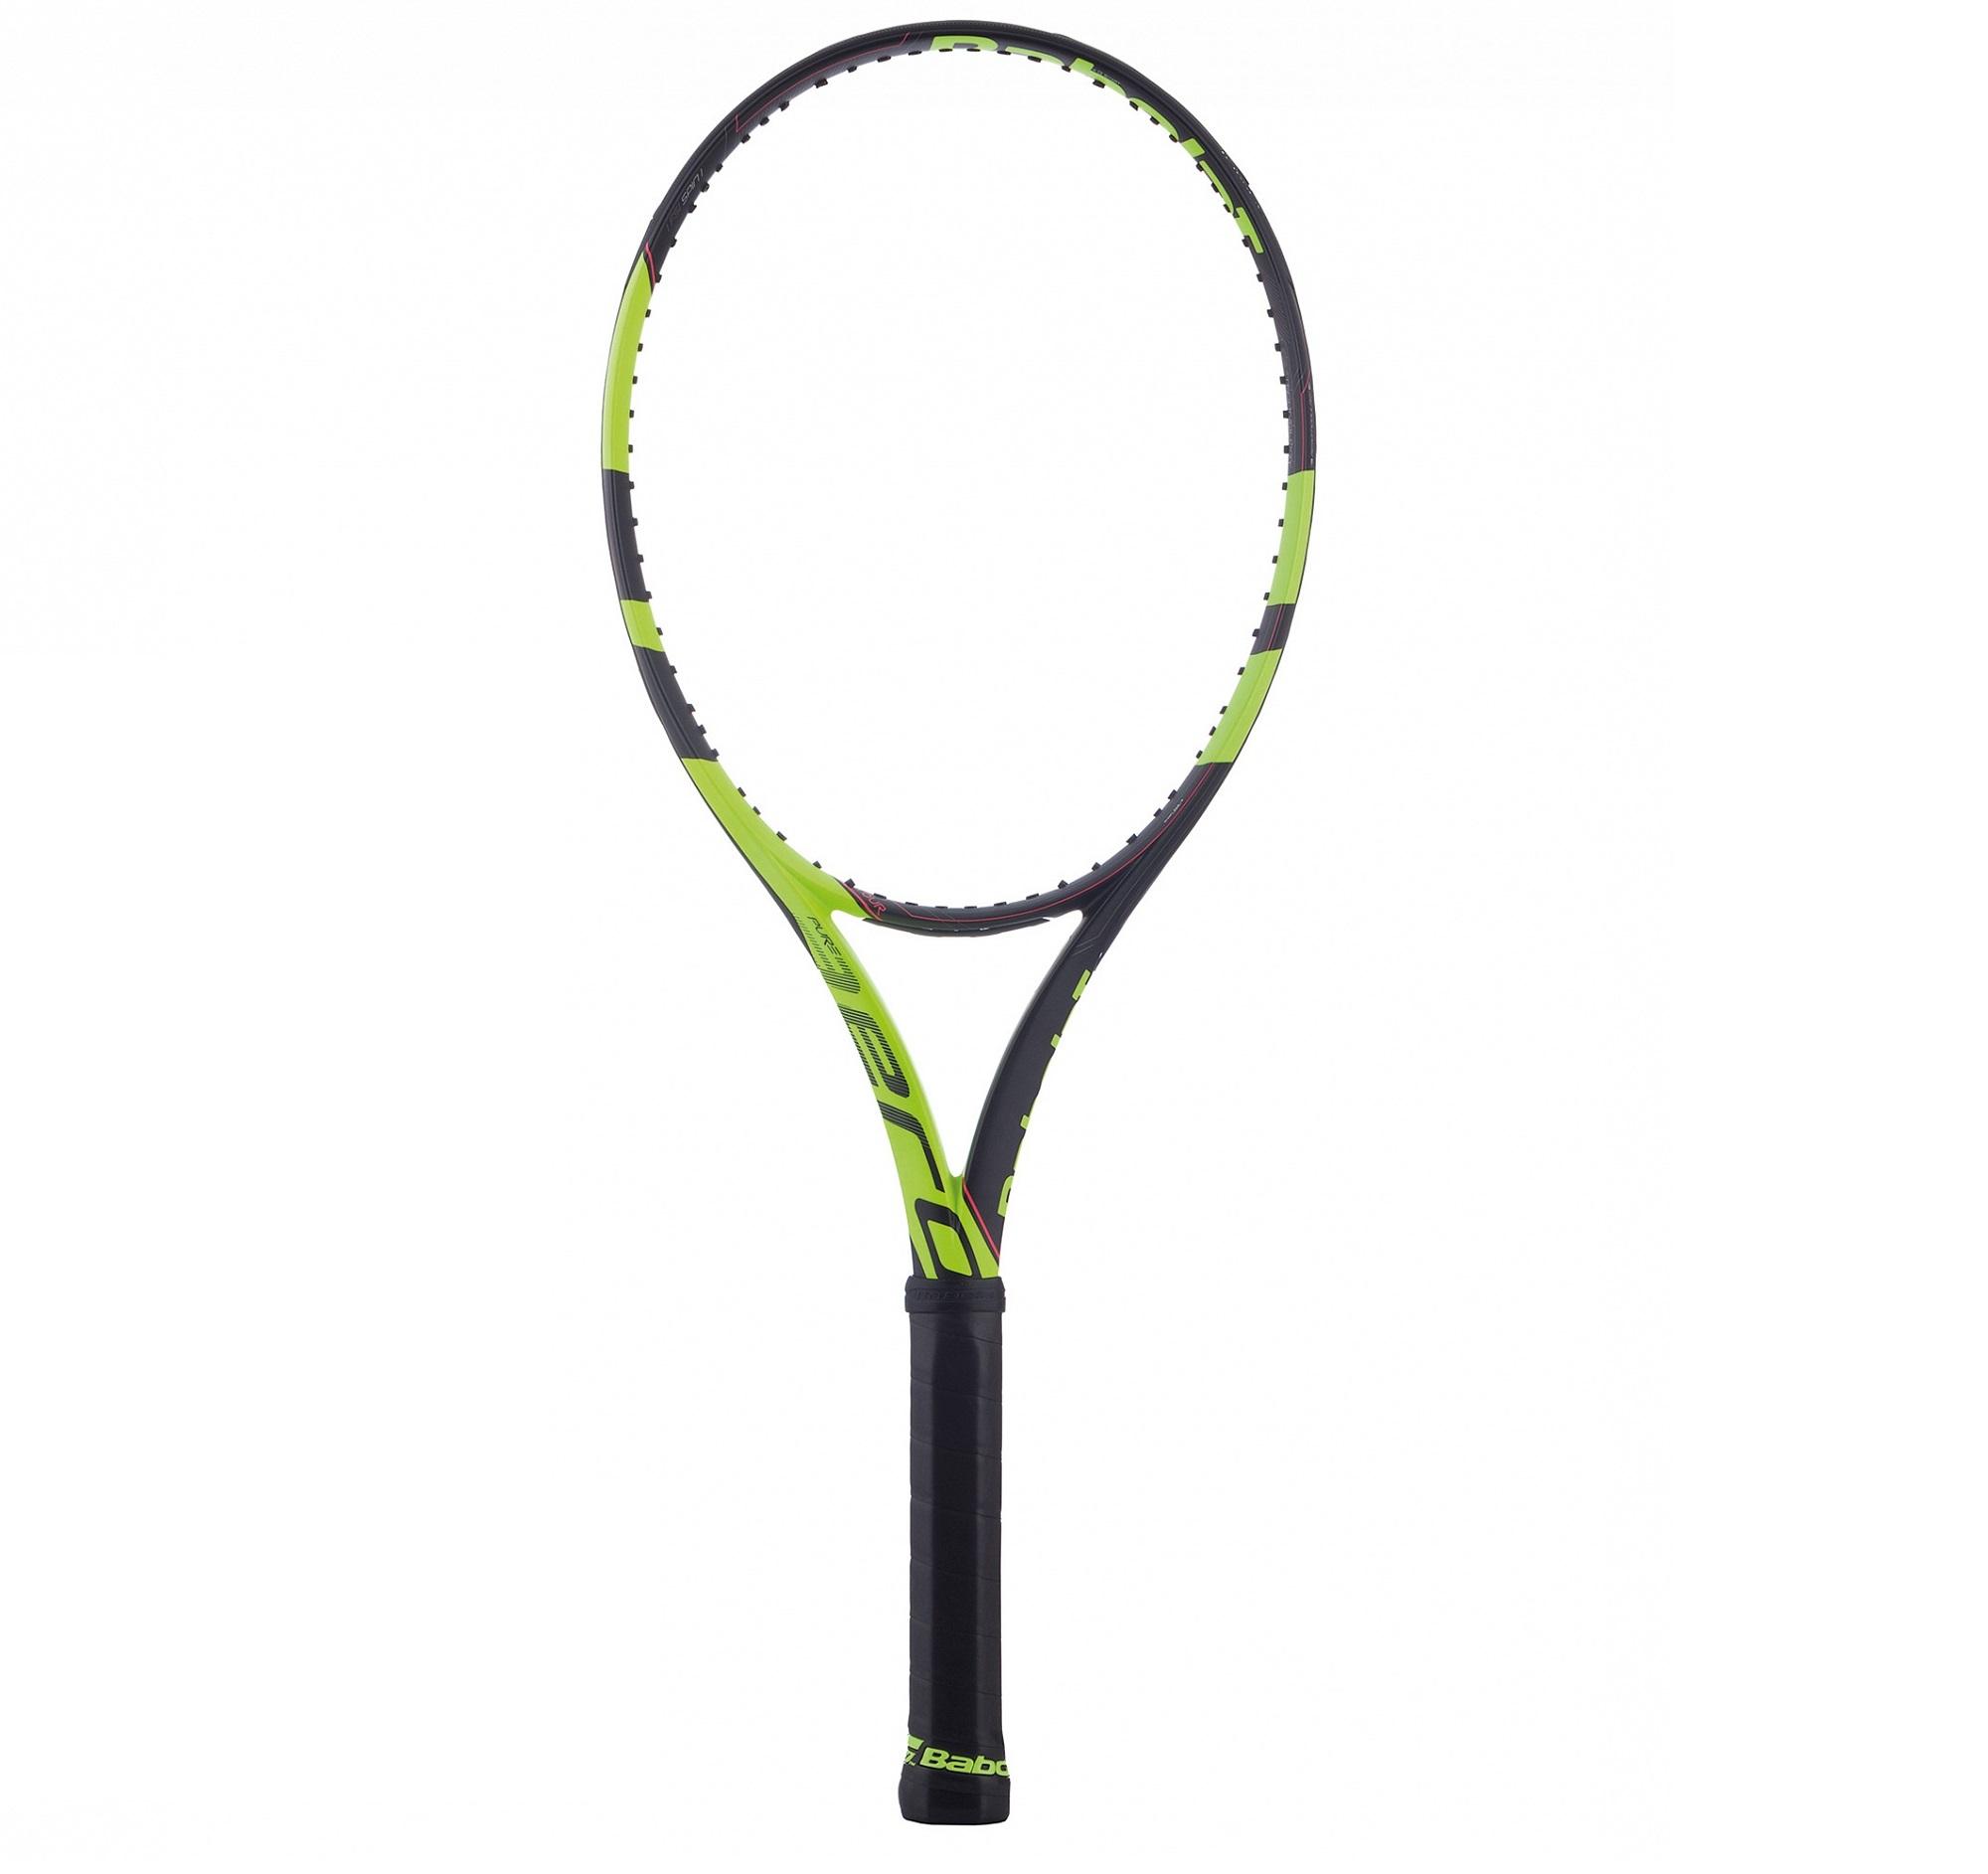 Babolat Ракетка для большого тенниса Babolat Pure Aero Tour Unstrung сетки для тенниса большого